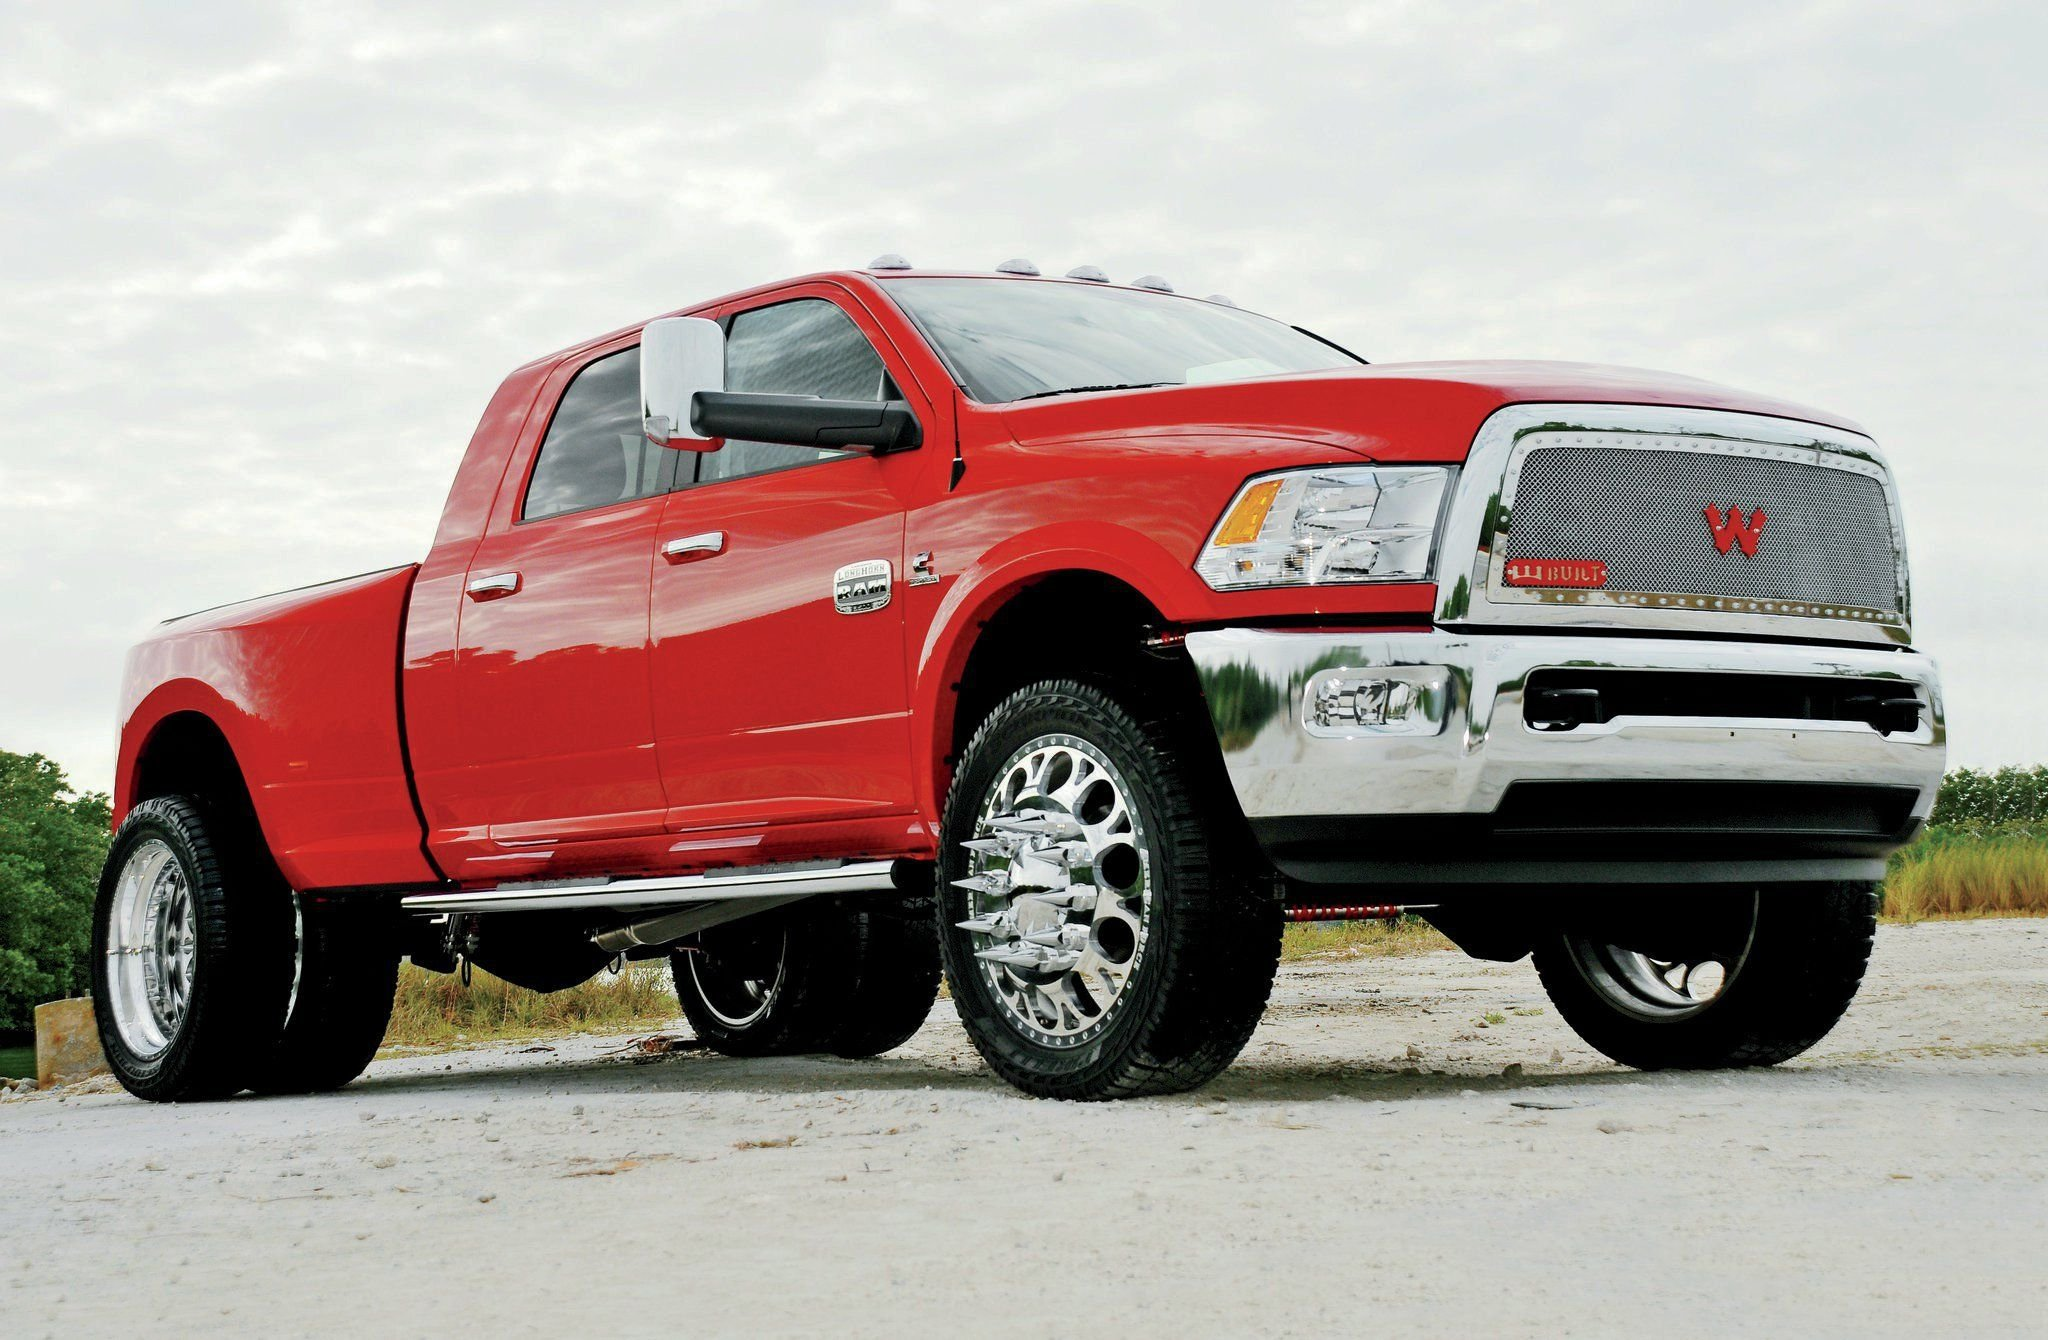 Lifted Ram 3500 >> 2012 Dodge Ram 3500 pickup custom tuning dualie wallpaper | 2048x1340 | 865054 | WallpaperUP